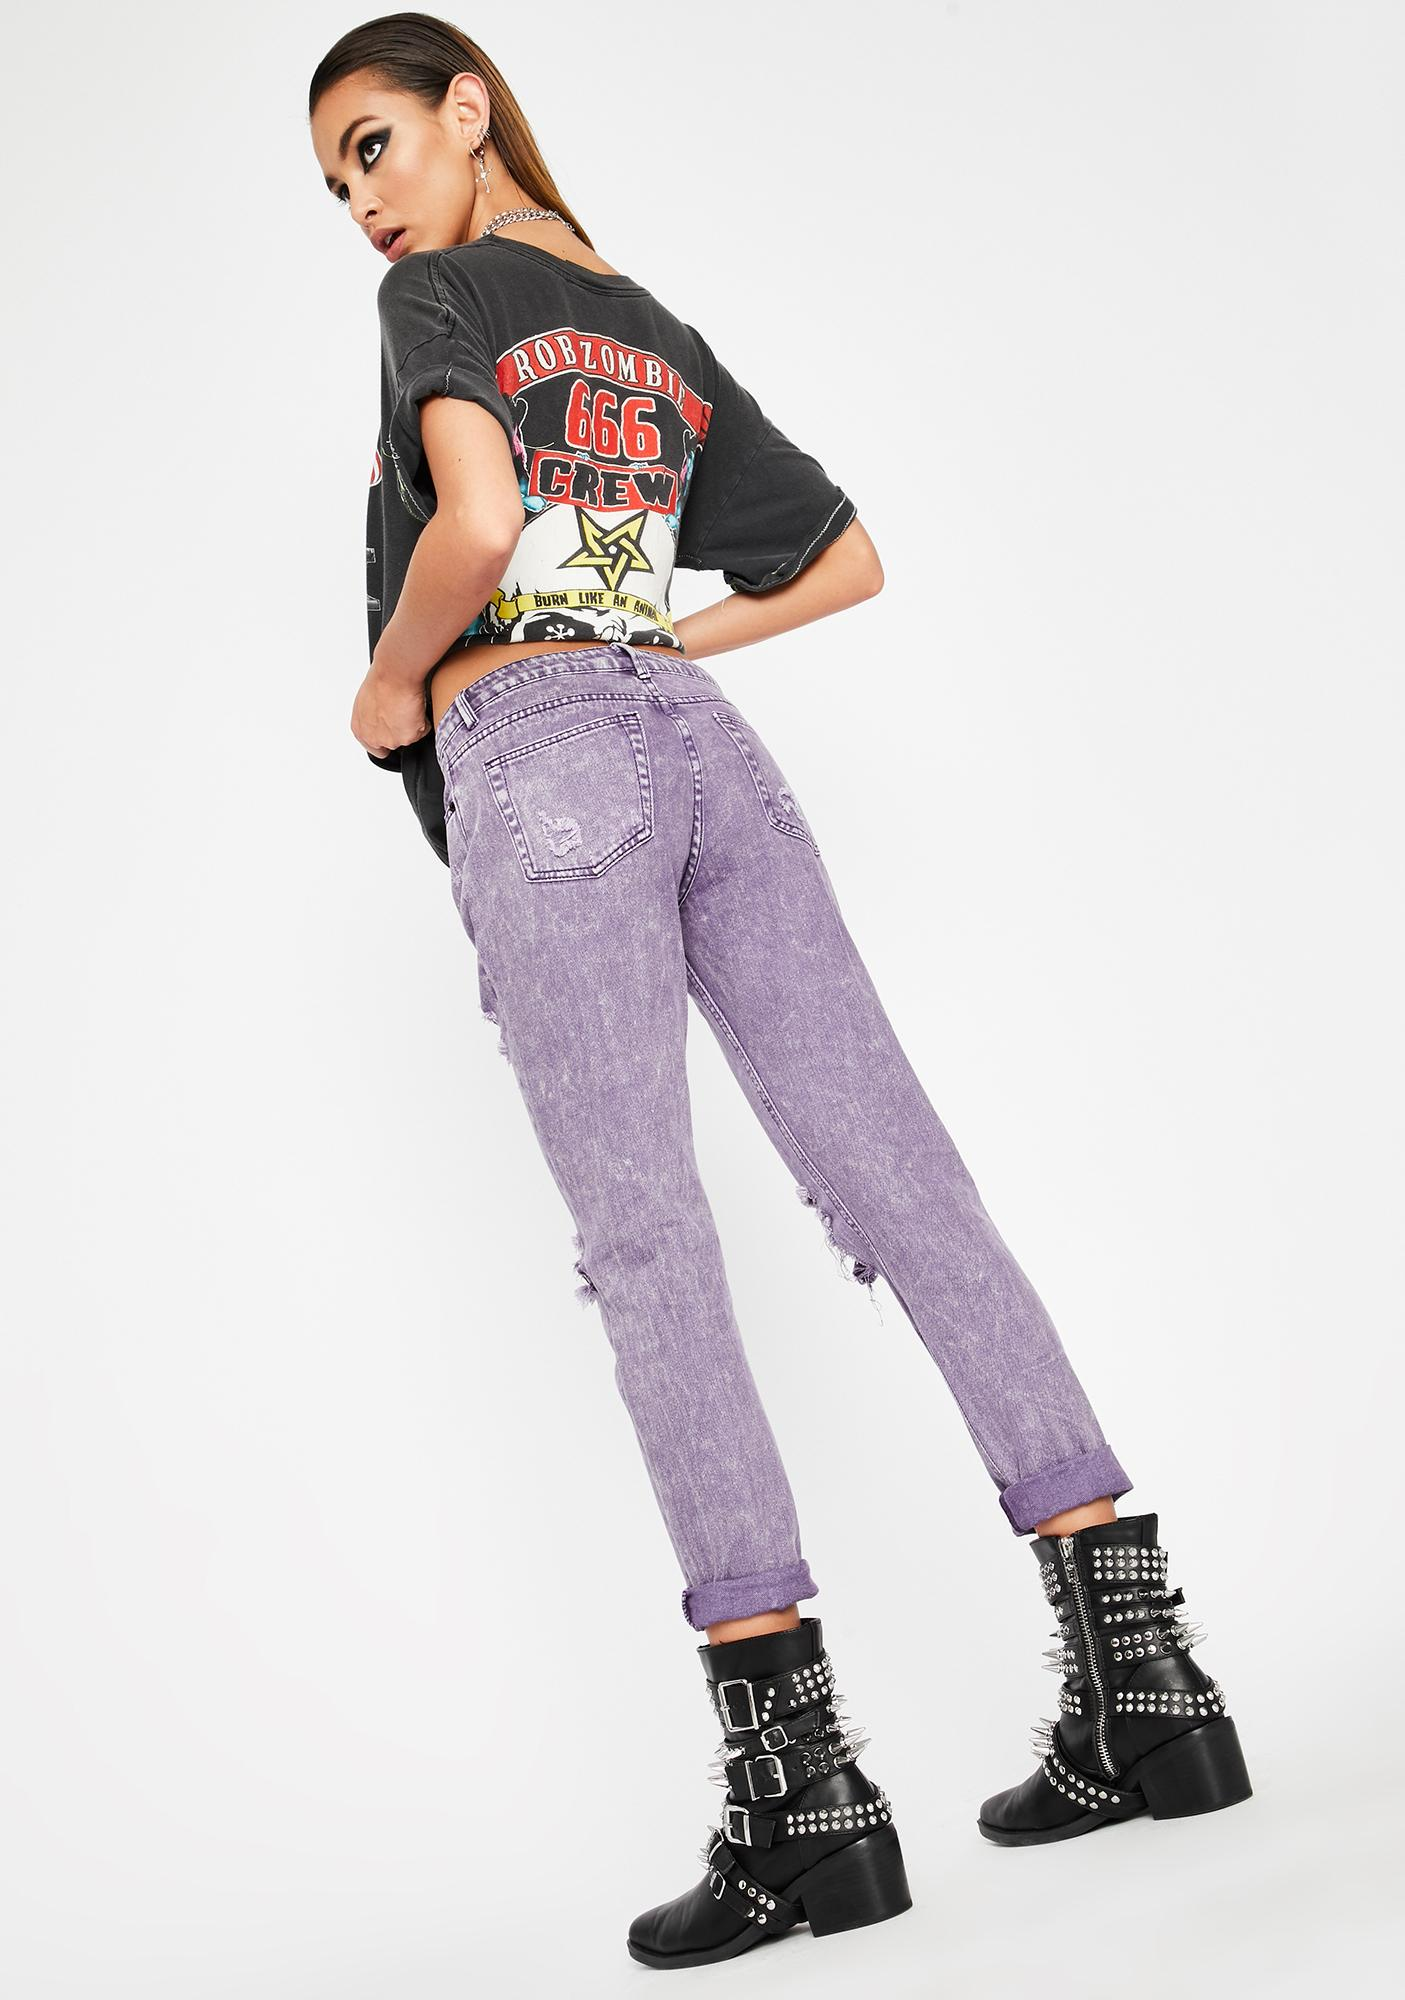 Purp Hardcore Hooligan Distressed Jeans